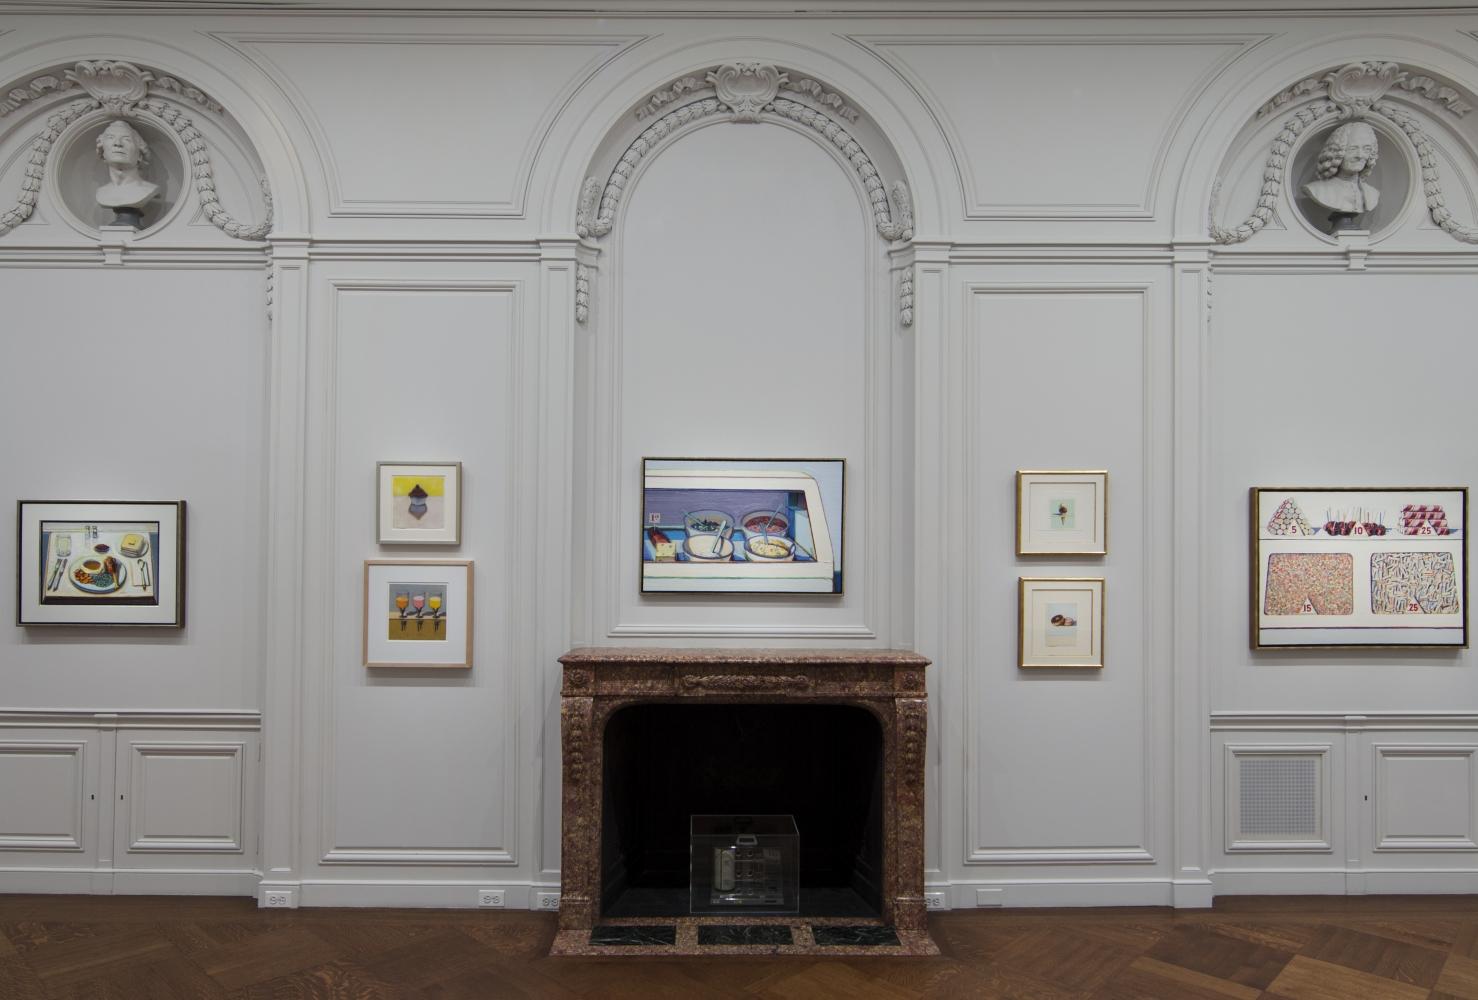 Installation view of Wayne Thiebaud: A Retrospective, October 22 - November 29, 2012.